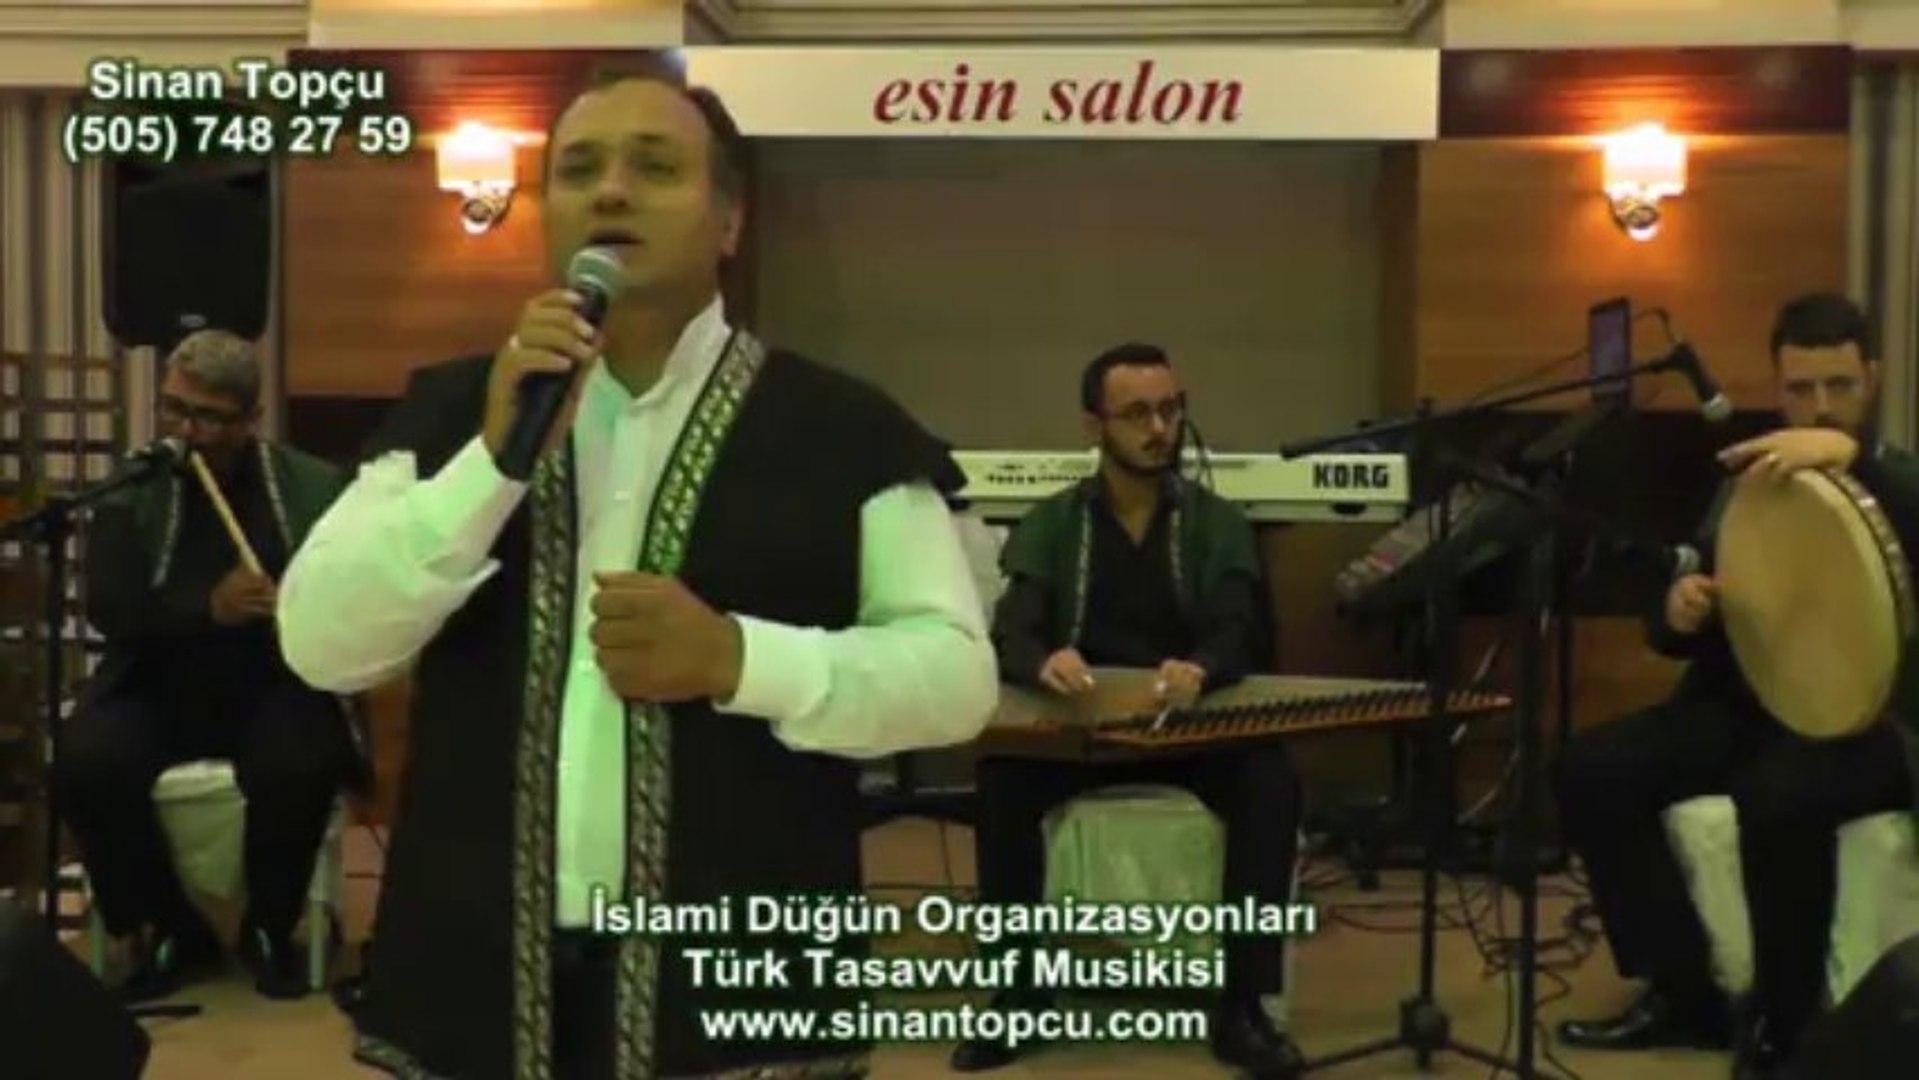 islami düğün organizasyonları sinan topçu bursa ilahi grubu islami düğün fiyatları